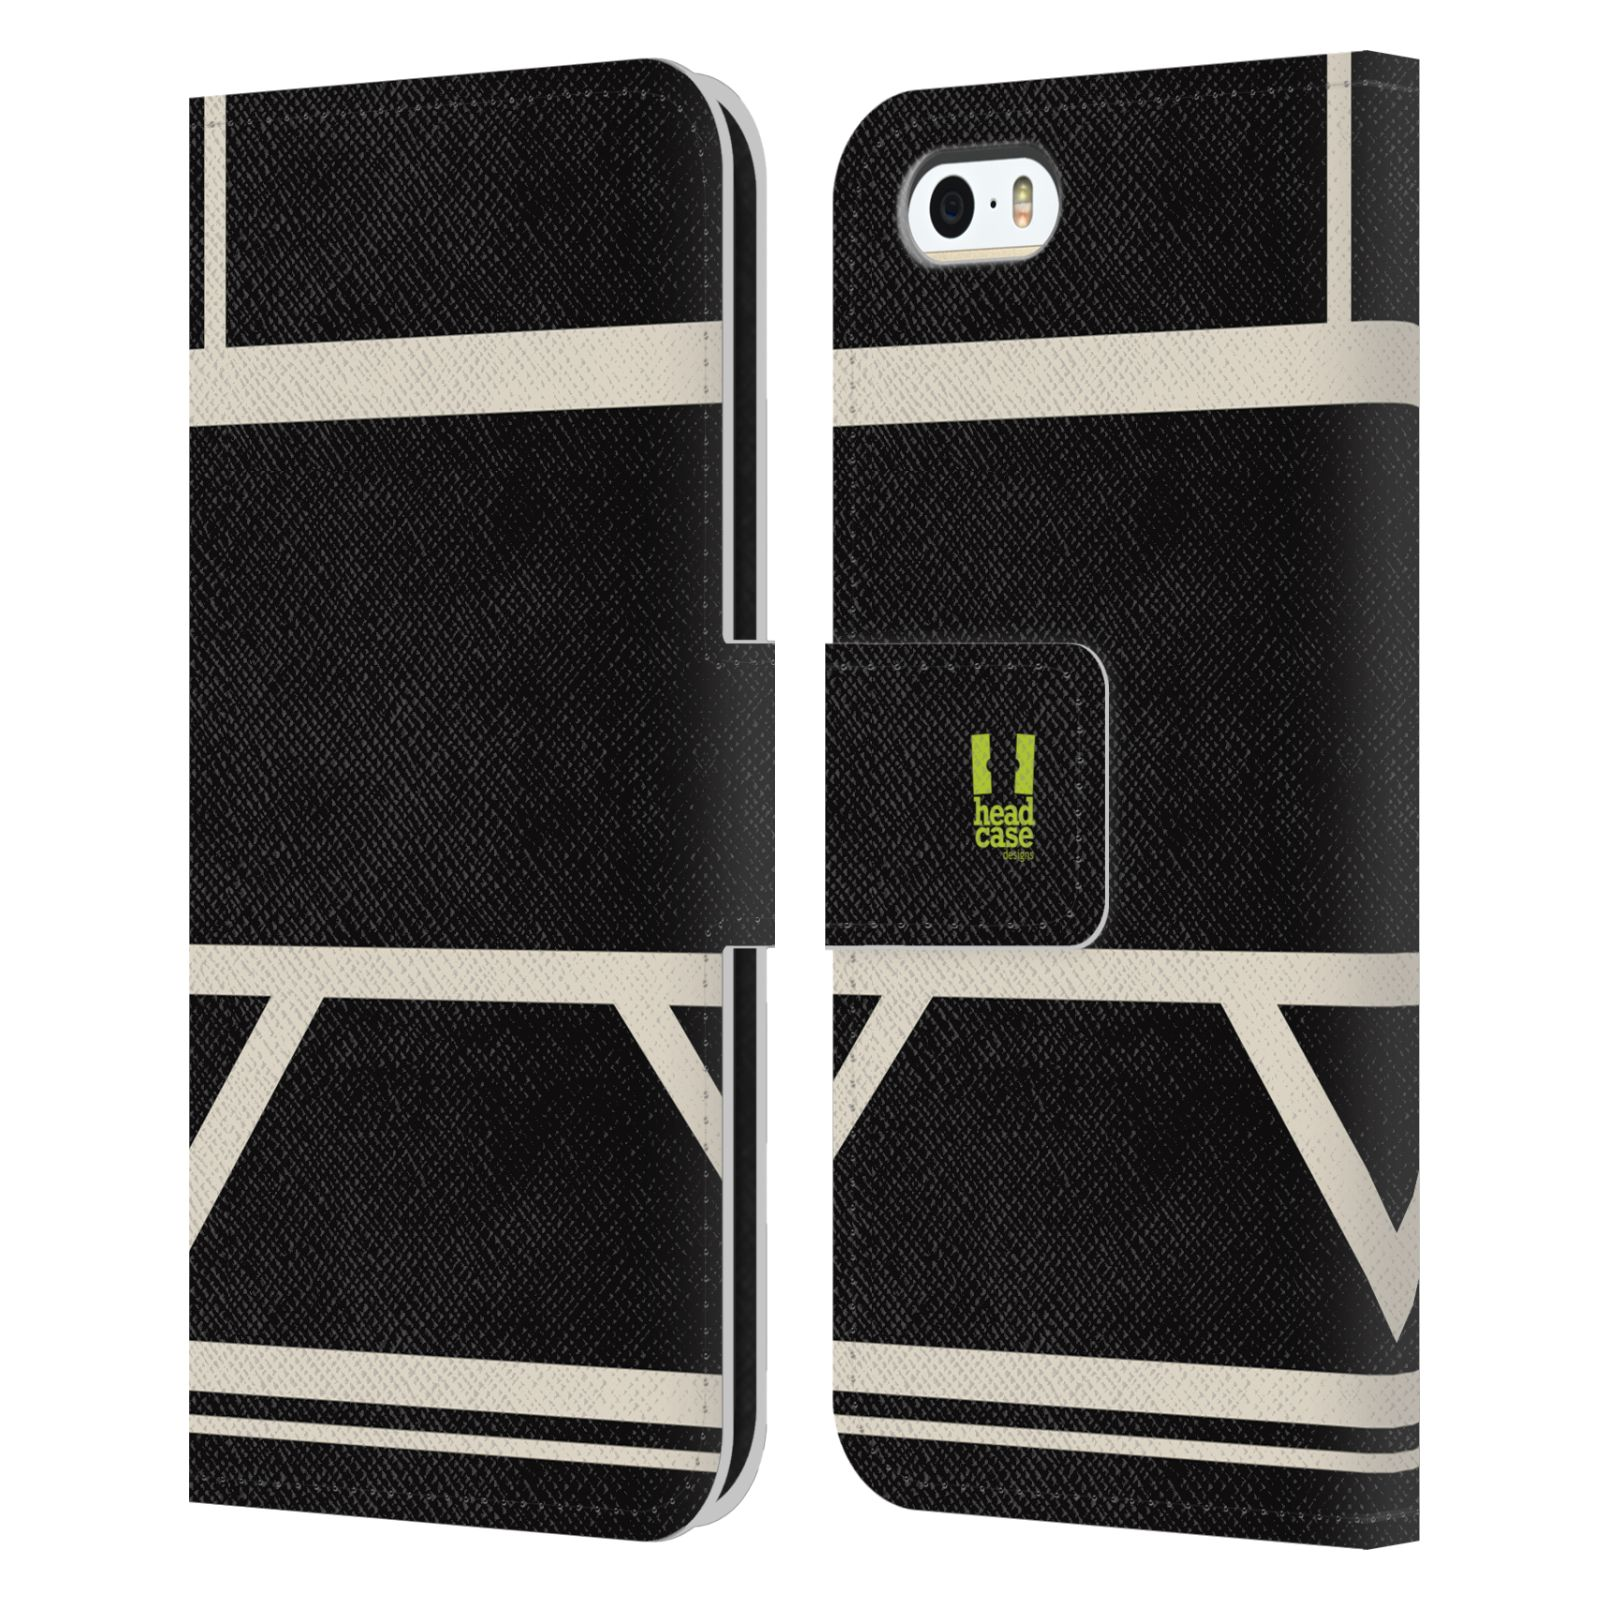 HEAD CASE Flipové pouzdro pro mobil Apple Iphone 5/5S barevné tvary černá a bílá proužek